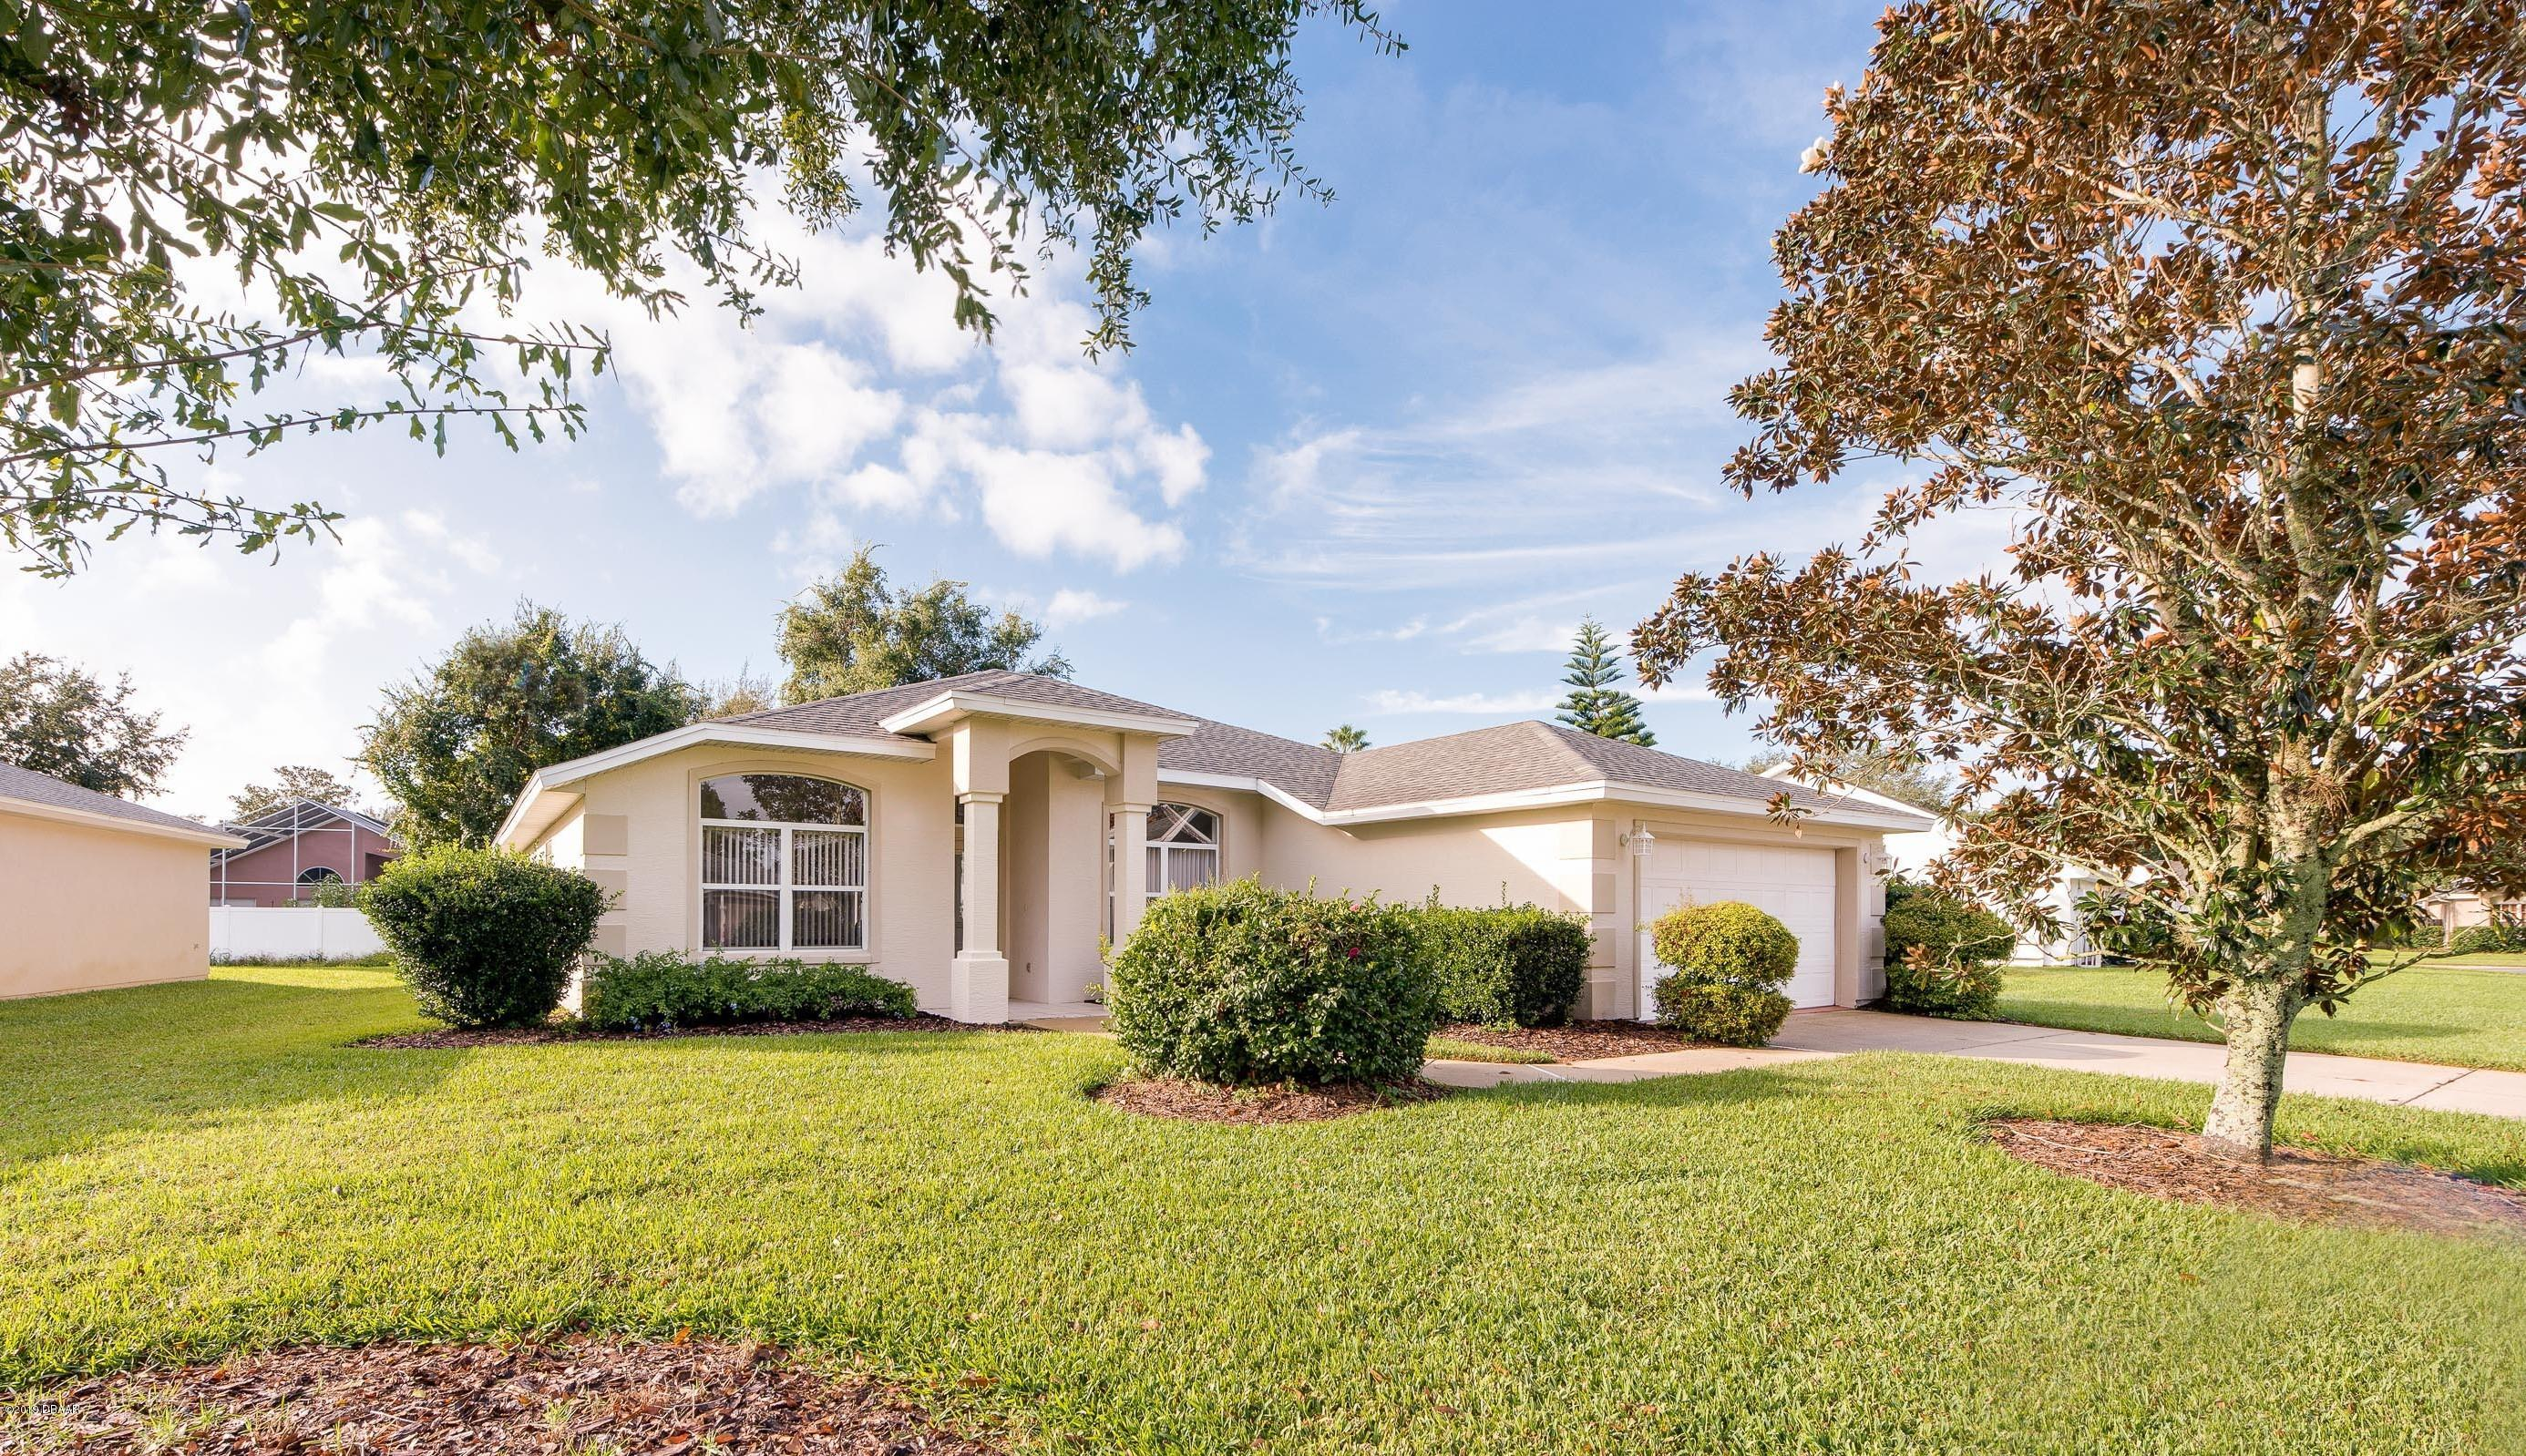 Photo of 5978 Heron Pond Drive, Port Orange, FL 32128